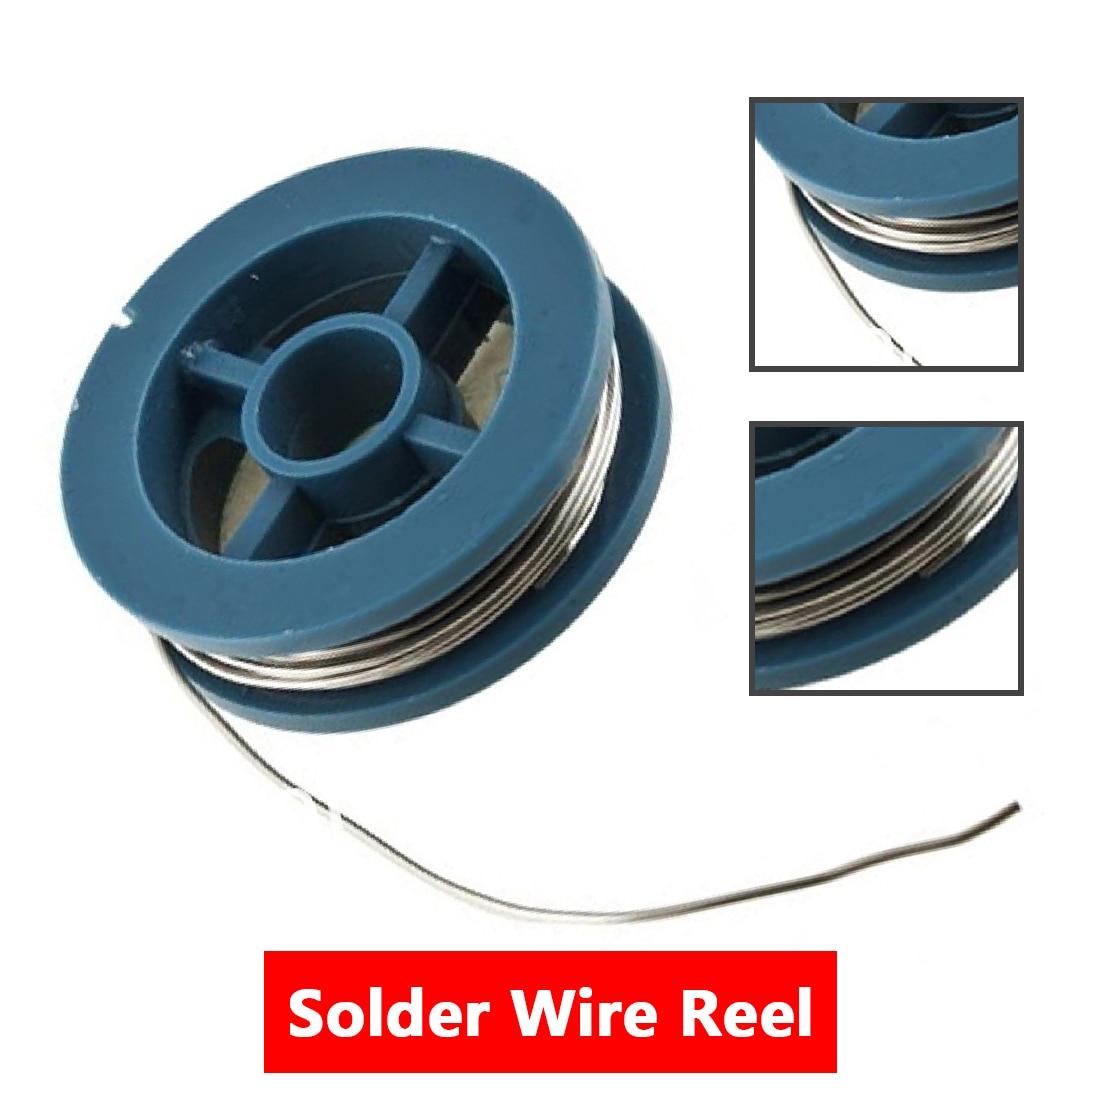 0.8mm Tin Rosin Core Tin/Lead Rosin Roll Flux Solder Wire Reel 361f/183c Melting Point 1.7m